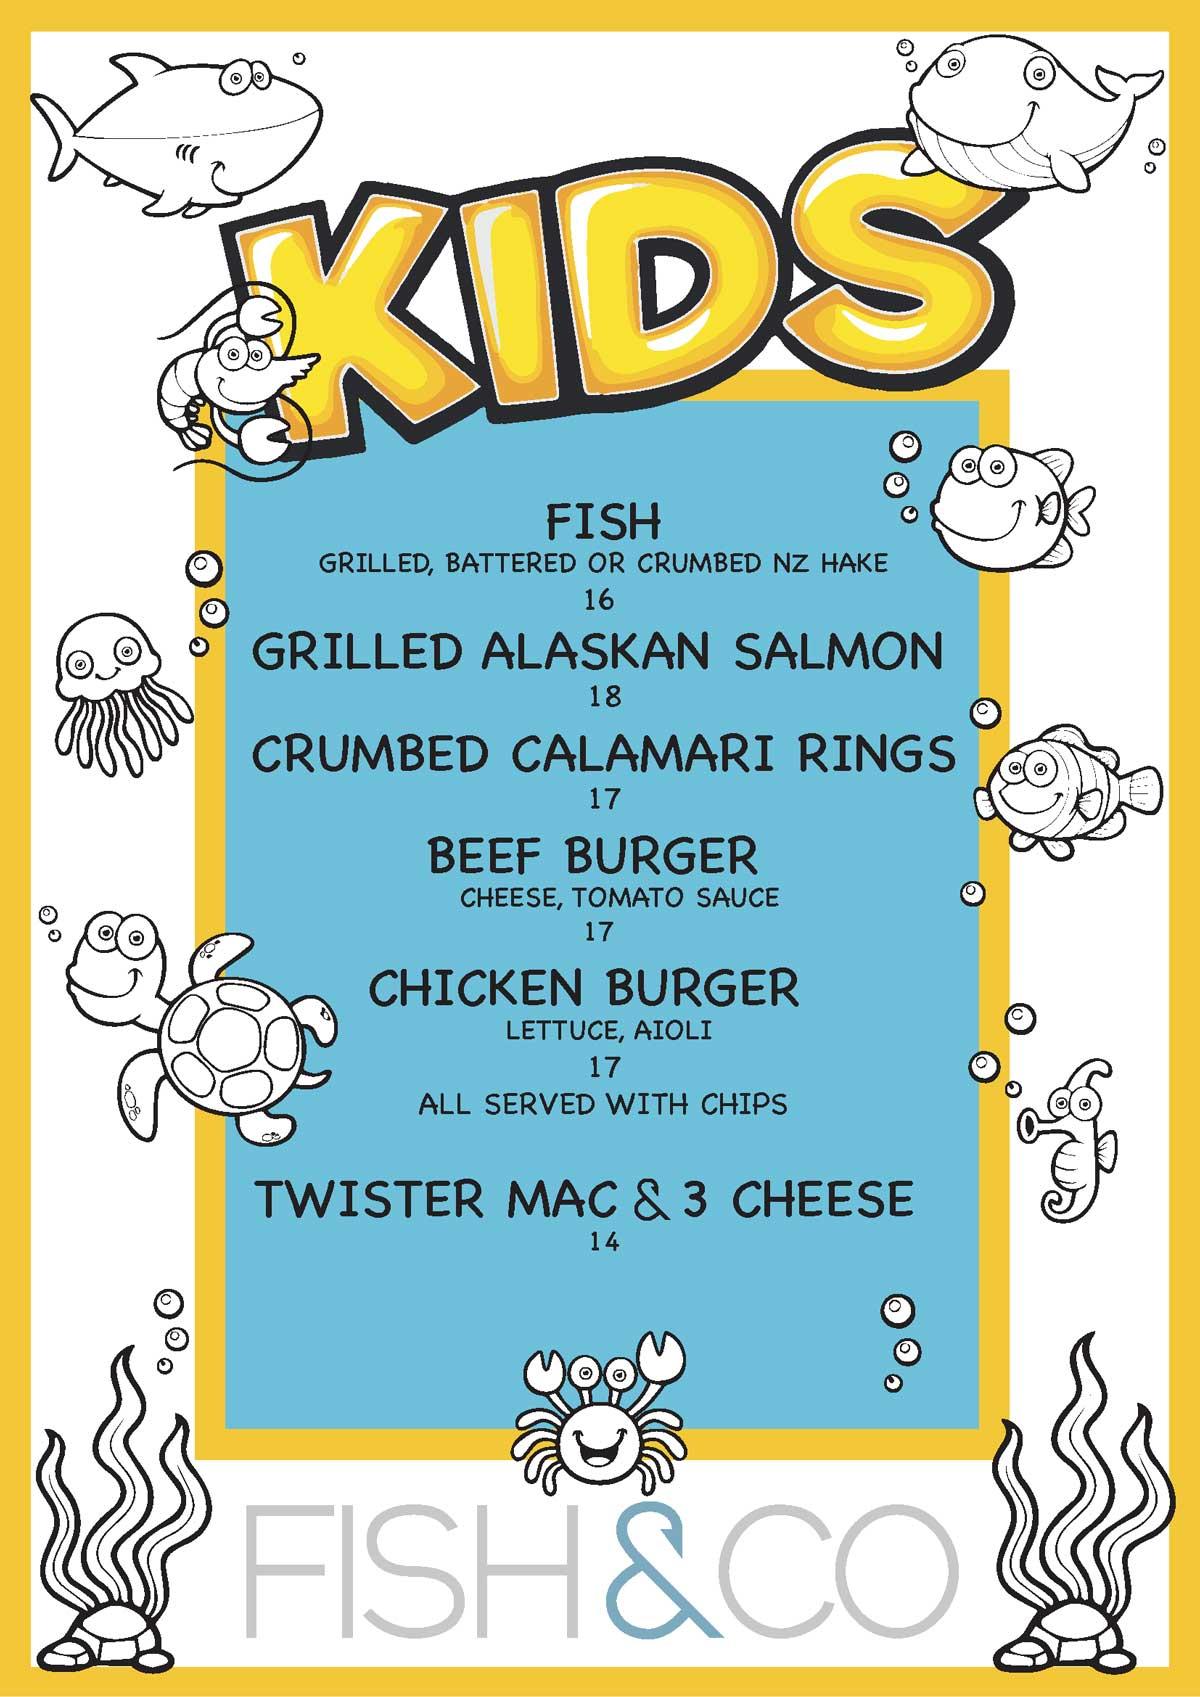 fish and co kids Menu 2021